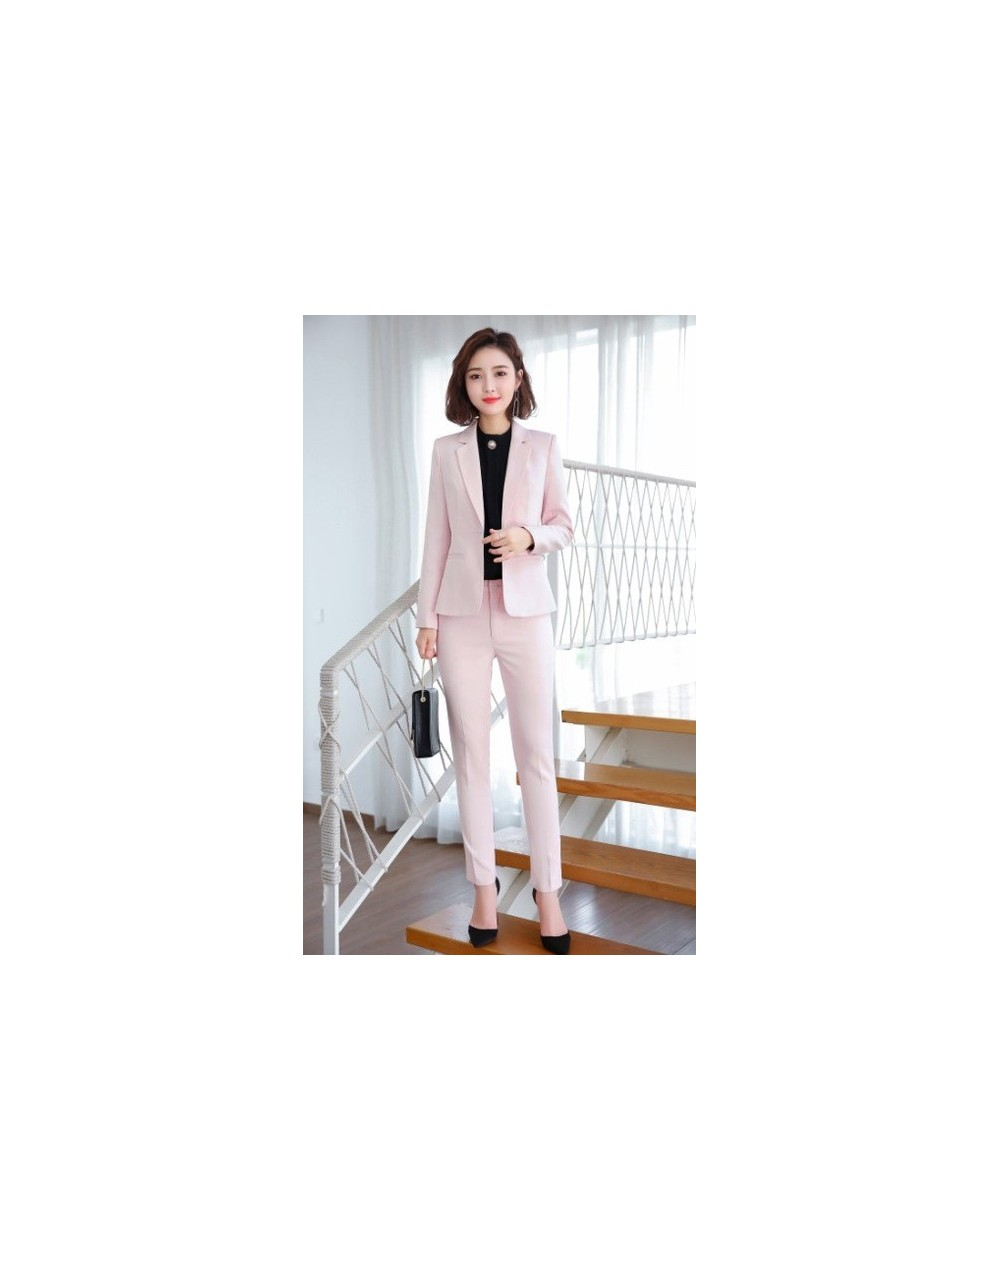 Fashion women pants suits 2019 Autumn new fashion temperament slim long sleeve blazer and pants office ladies foraml work we...